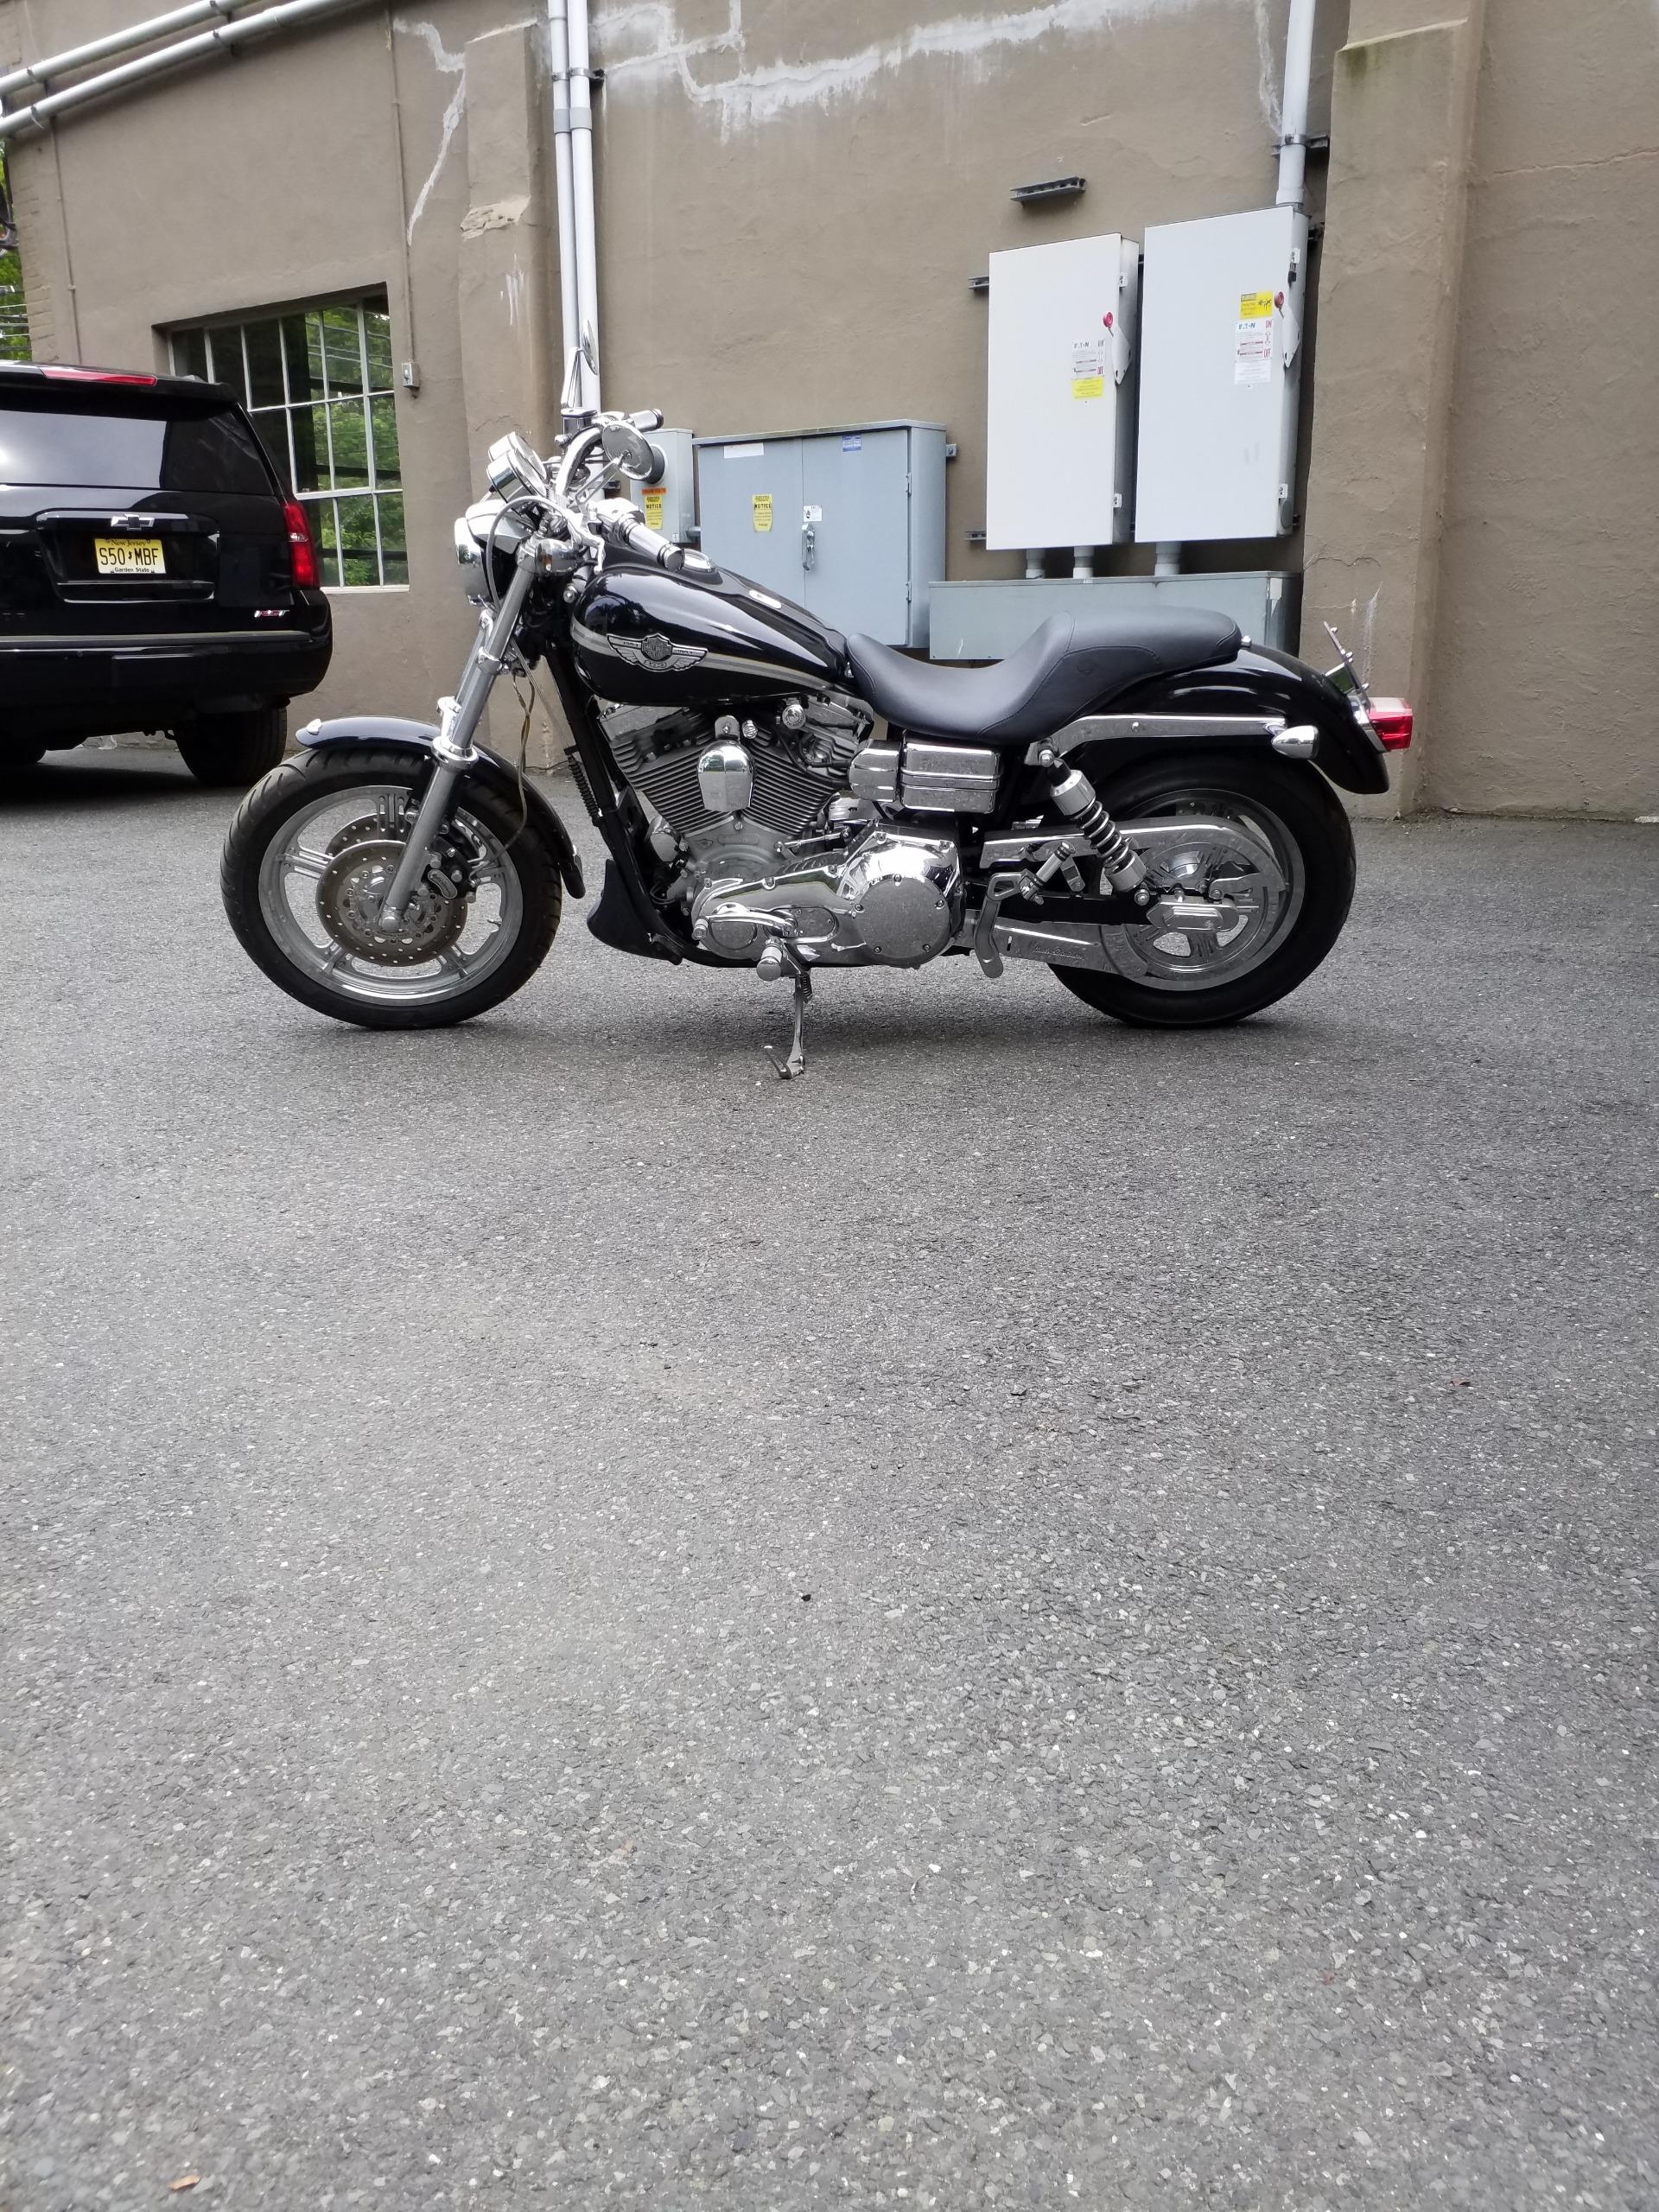 Used 2003 Harley - Davidson Super Glide 100th Anniversary | Peapack, NJ